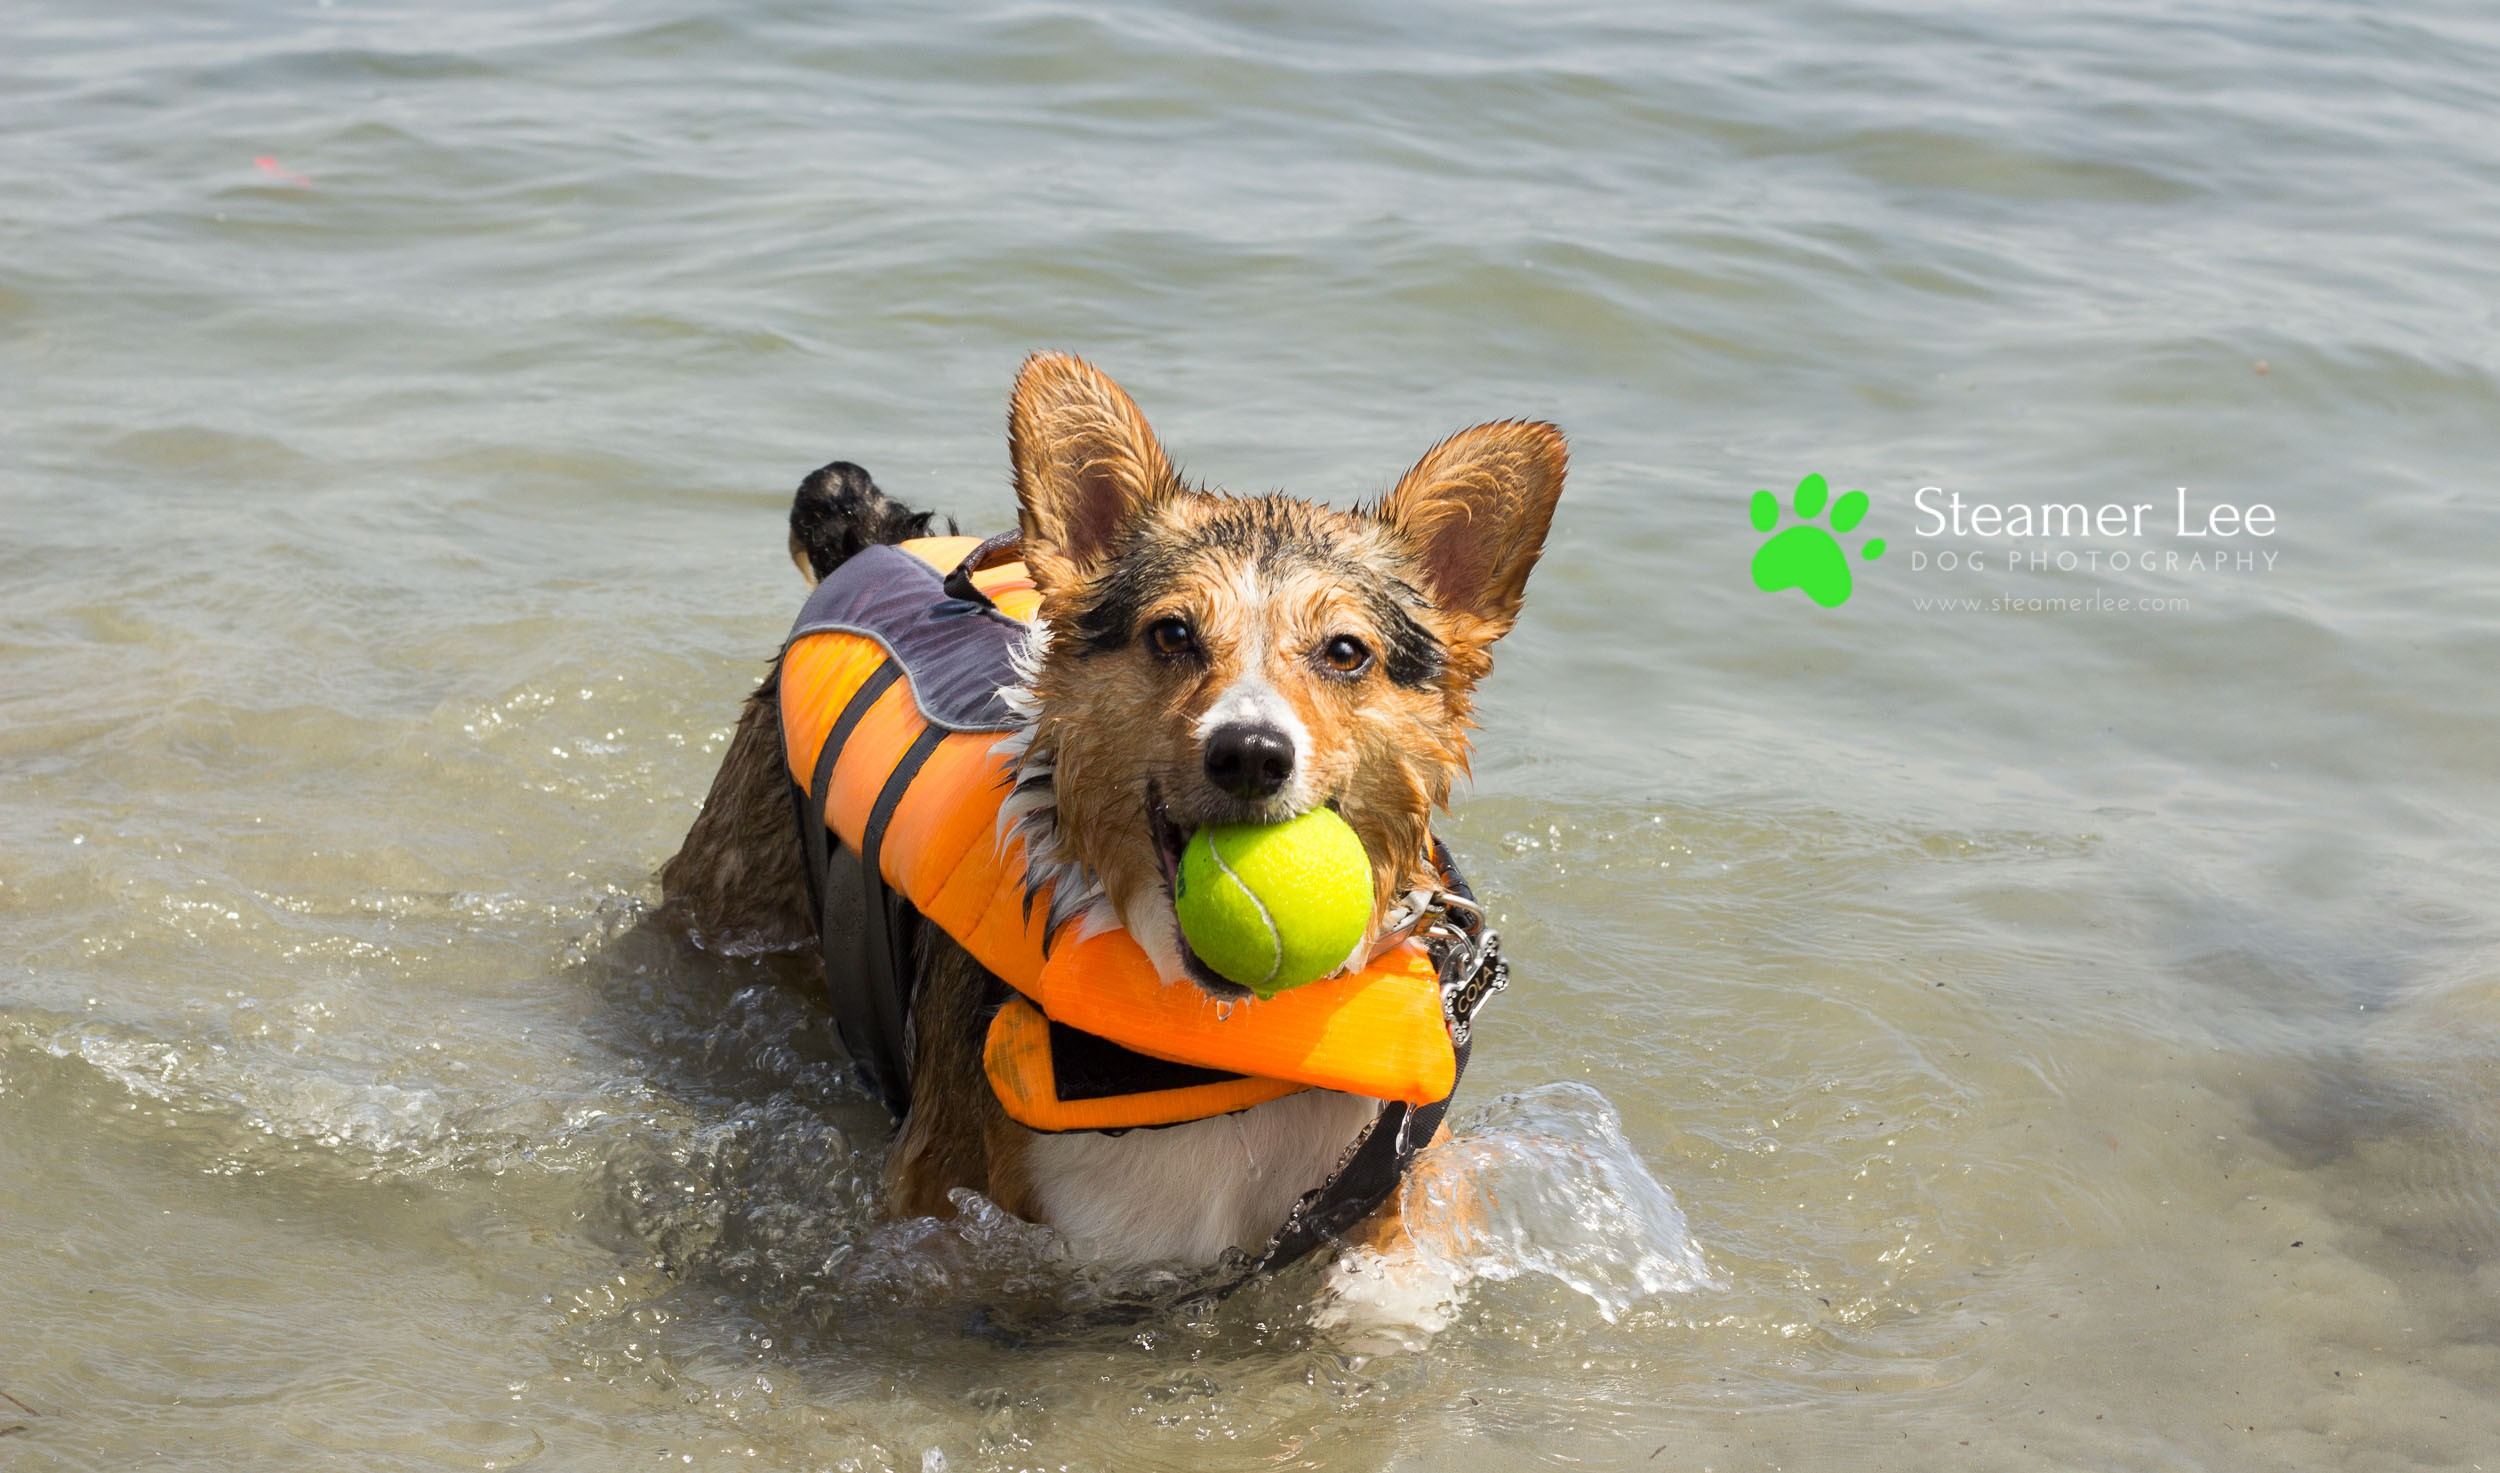 Steamer Lee Dog Photography - July 2017 So Cal Corgi Beach Day - Vol. 3 - 11.jpg